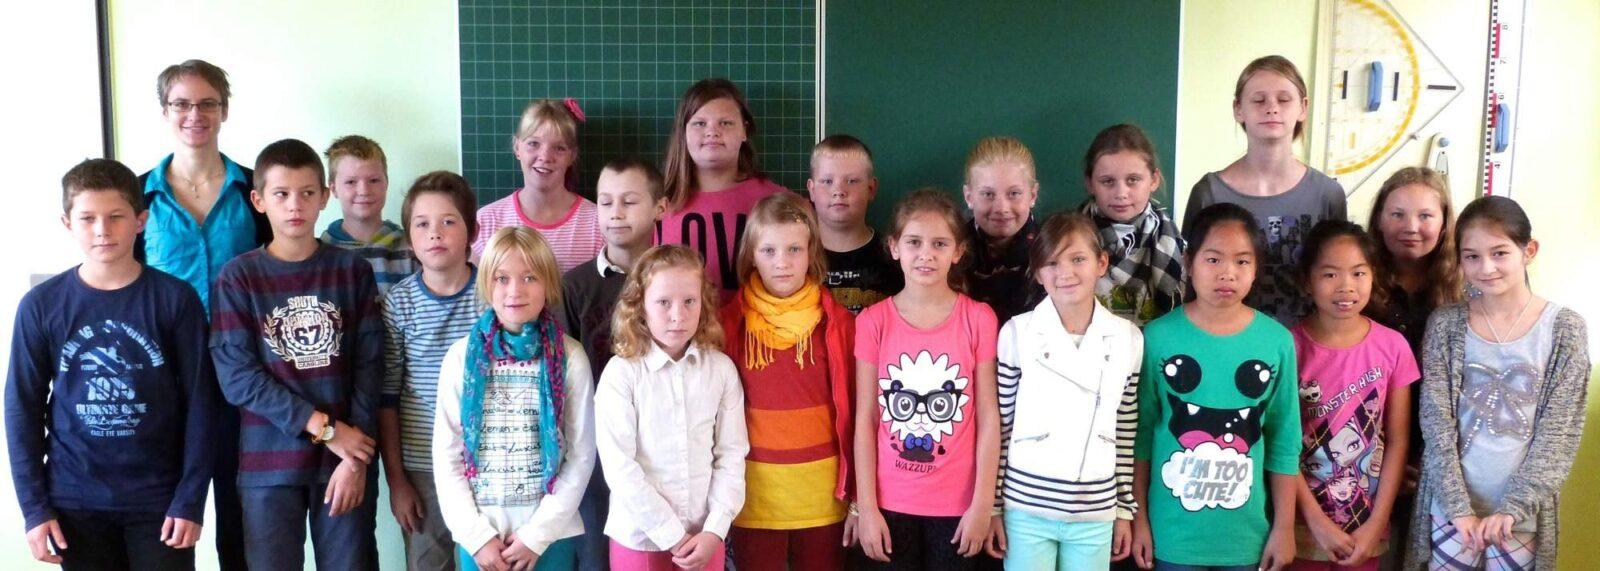 klasse-5d-2014